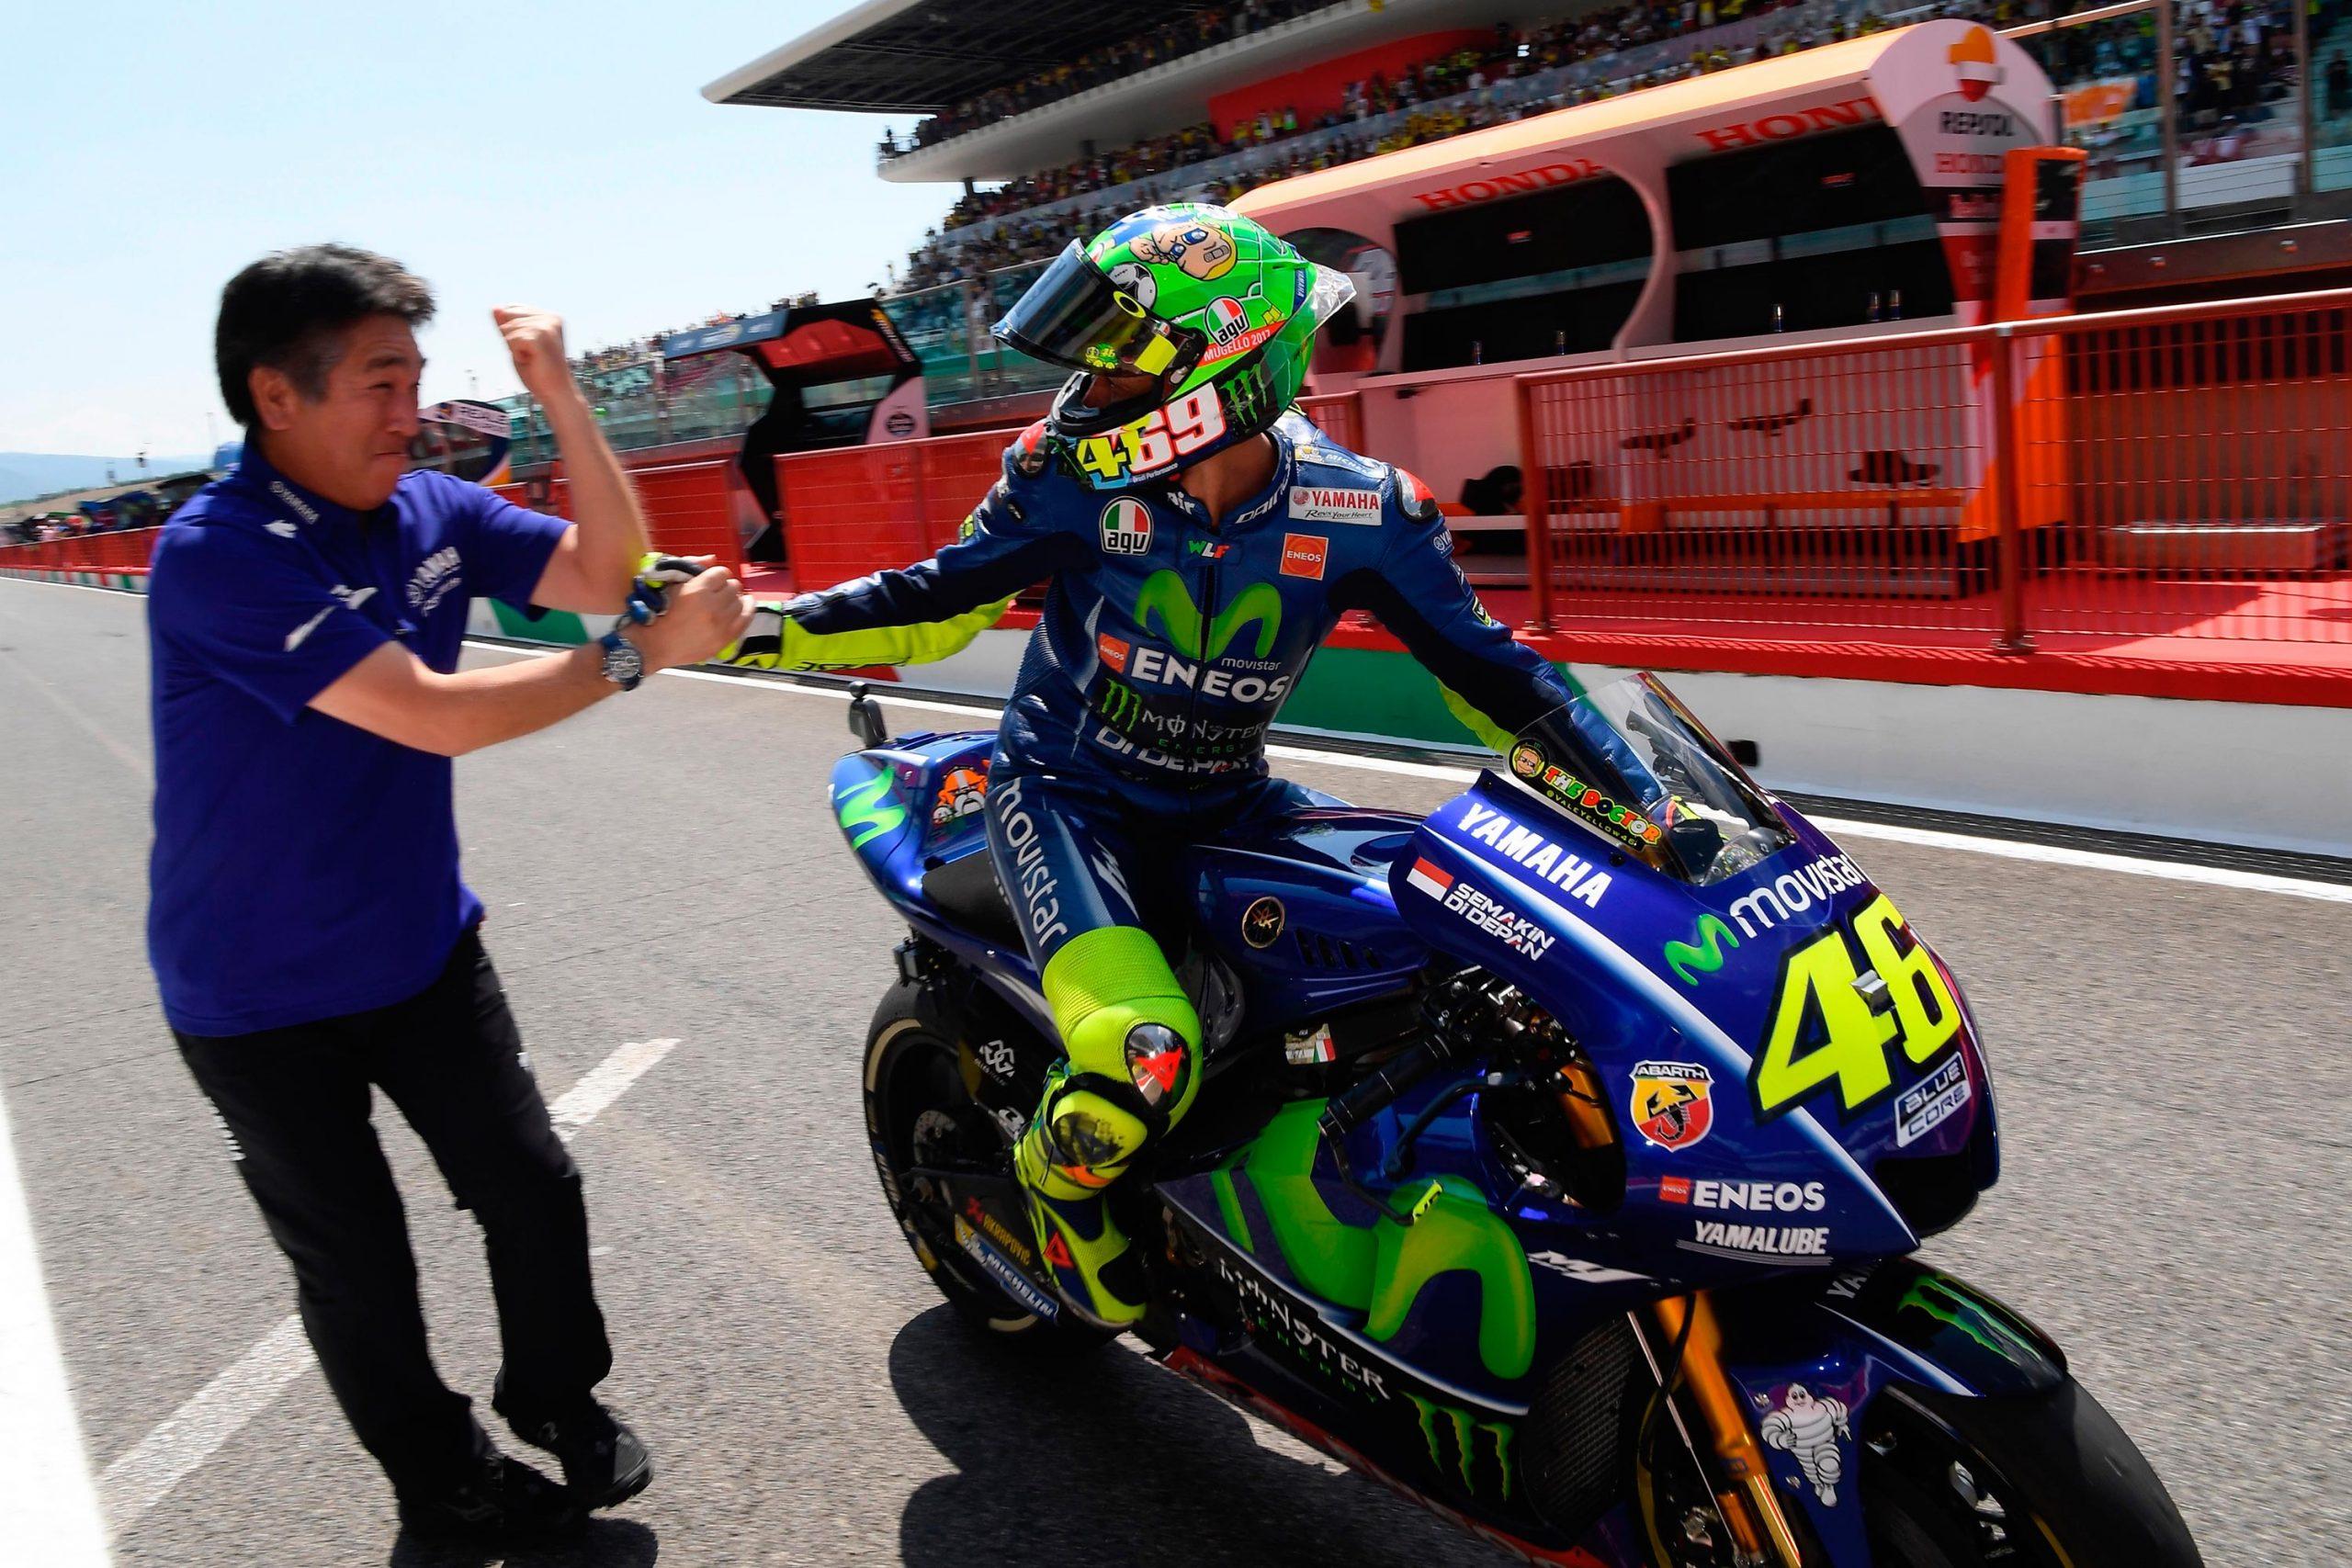 Saturday MotoGP Summary at Mugello: Rossis Recovery